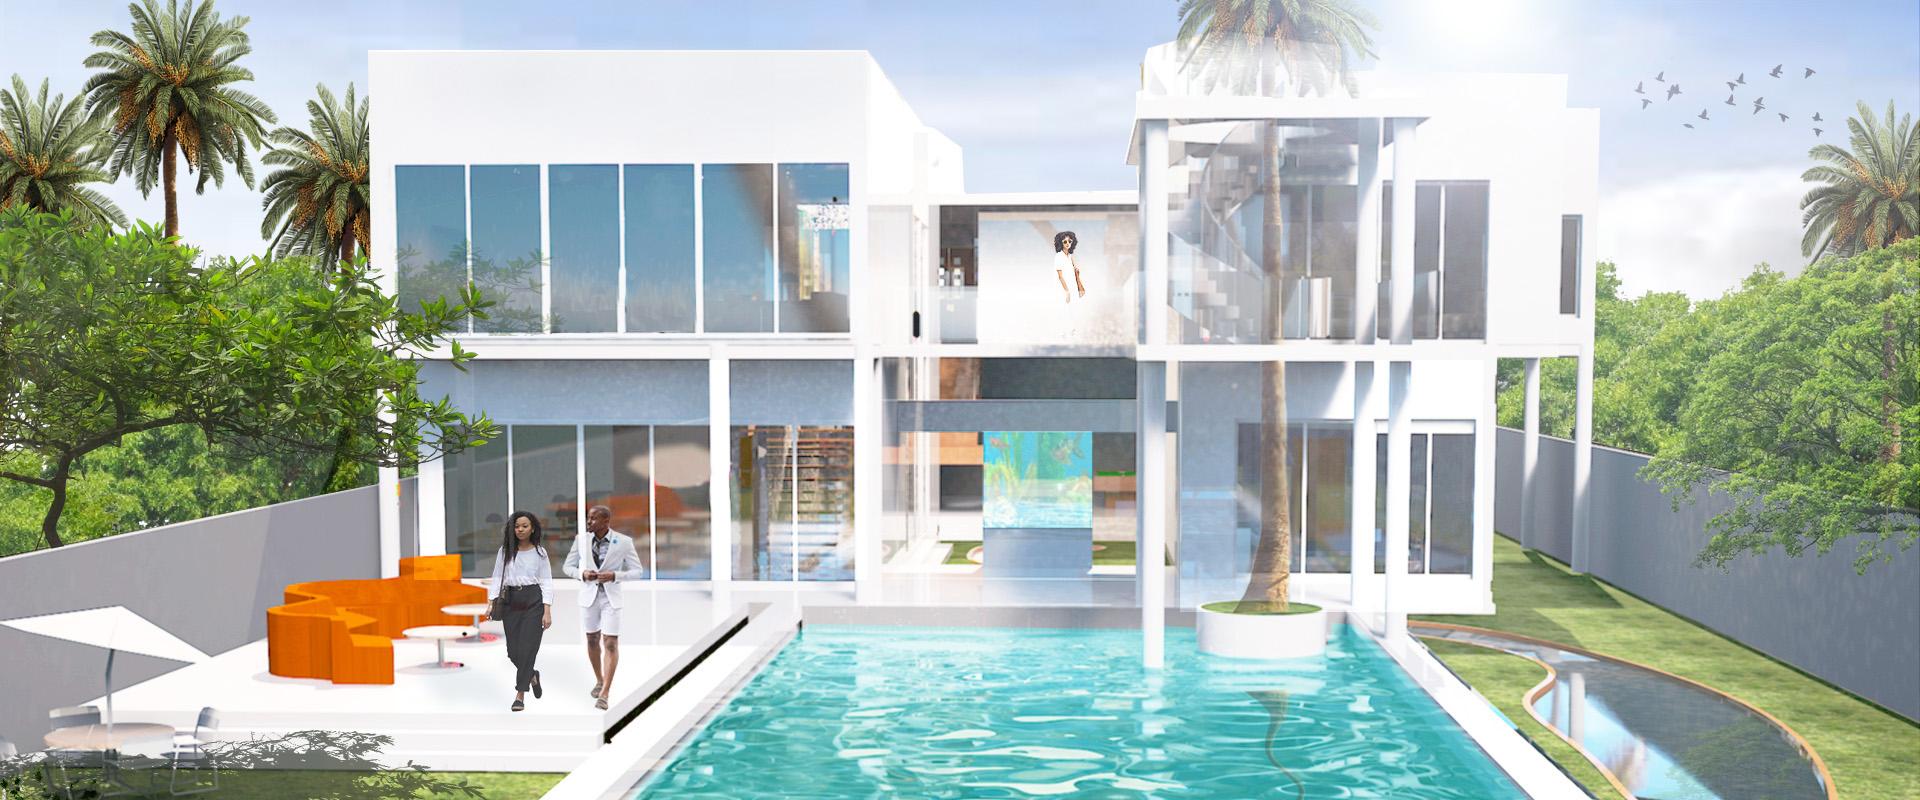 Villa WILL-T_1_barla_architectes_kribi_cameroun